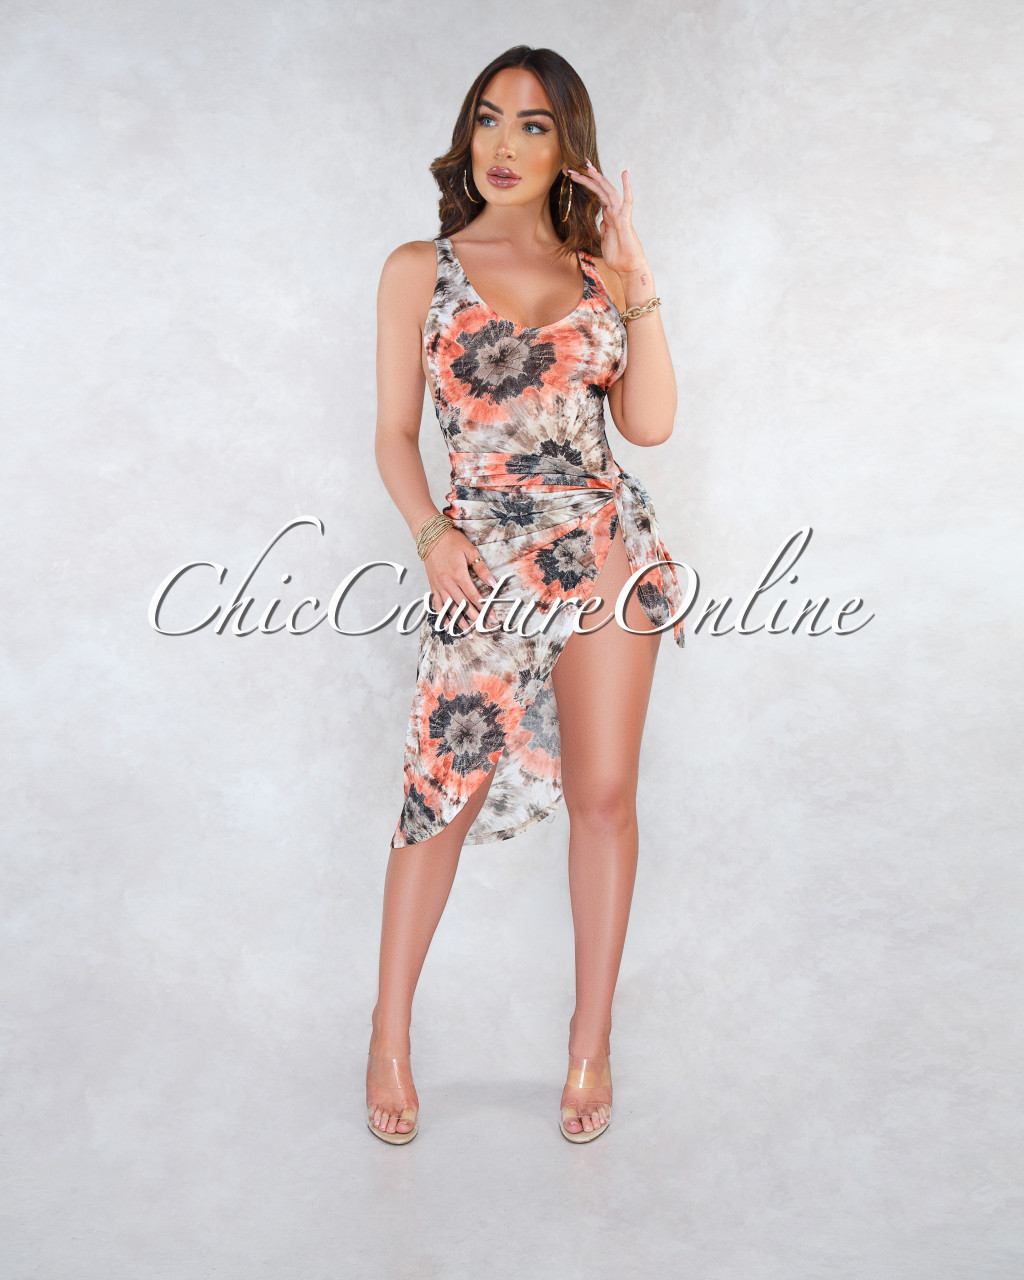 386ed72b3c Vivian Brown Orange Tie-Dye Mesh Skirt Cover Up Swimsuit Set